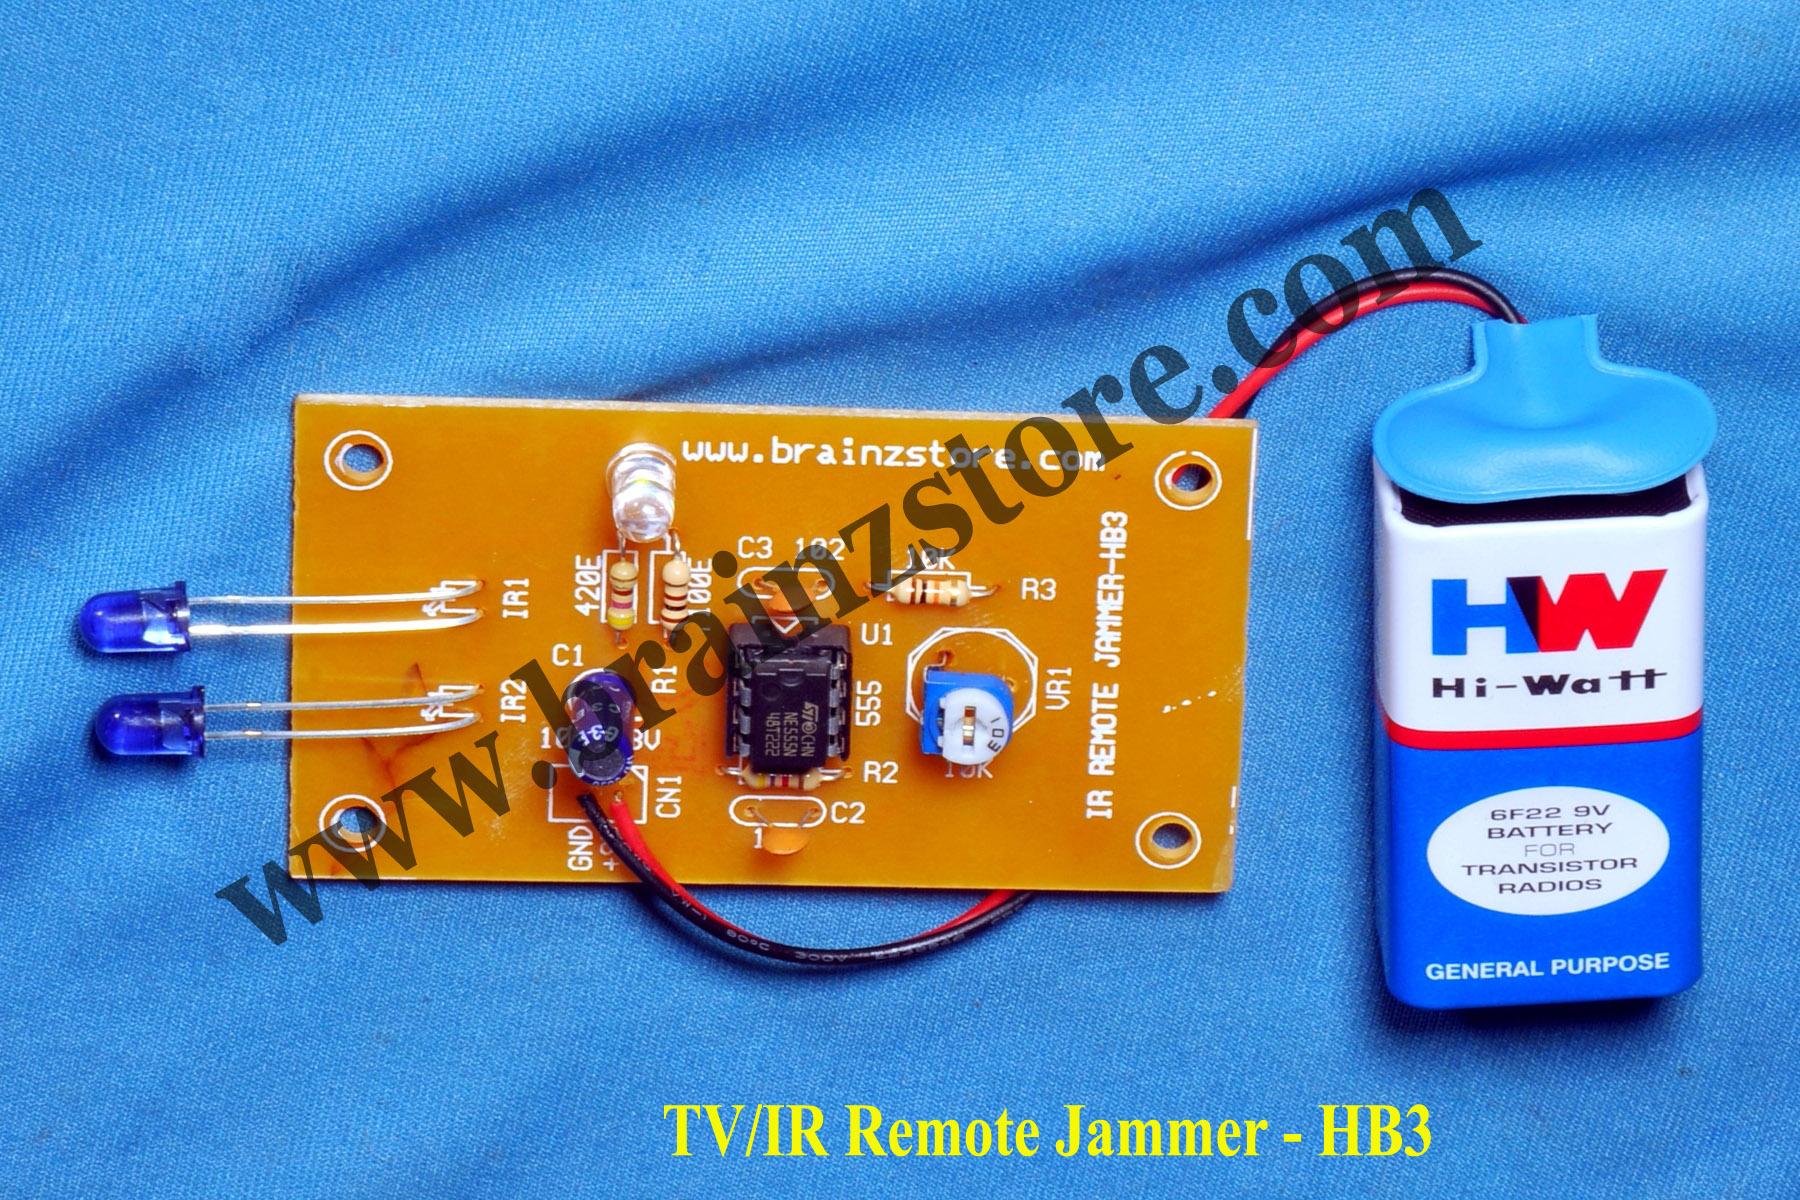 Signal blocker detector circuit - signal blocker detector home